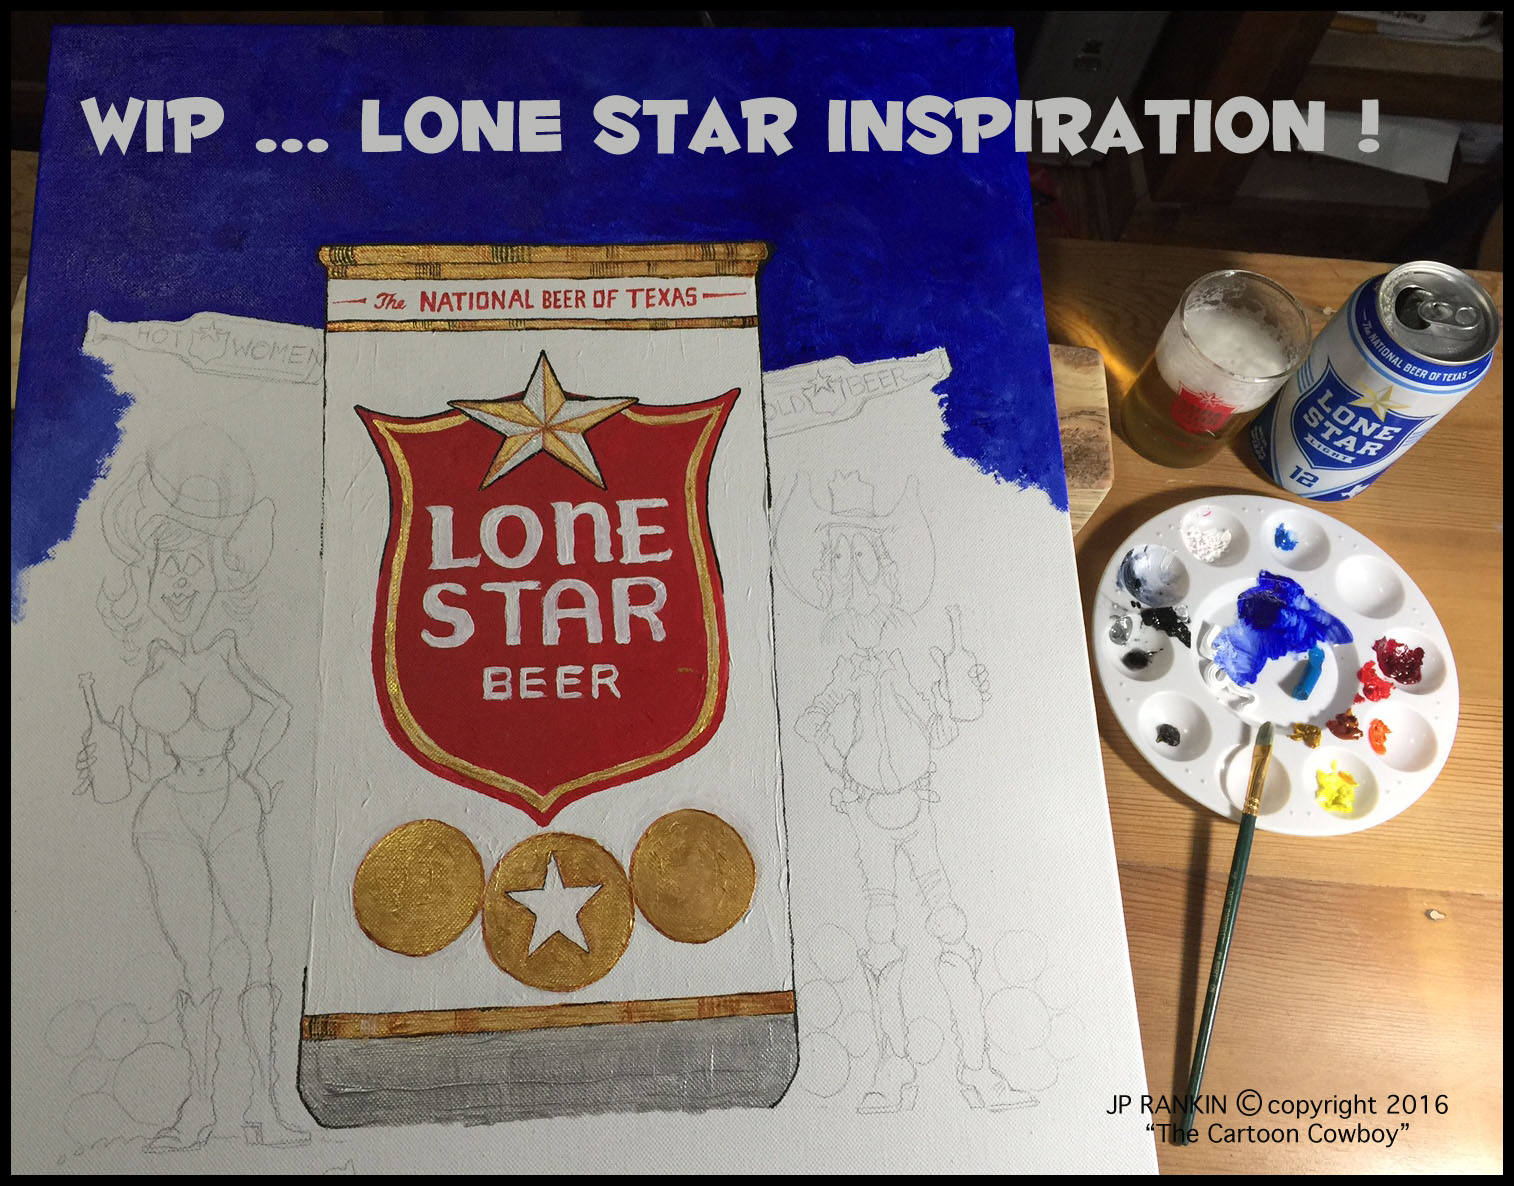 Lone Star Inspiration - WIP